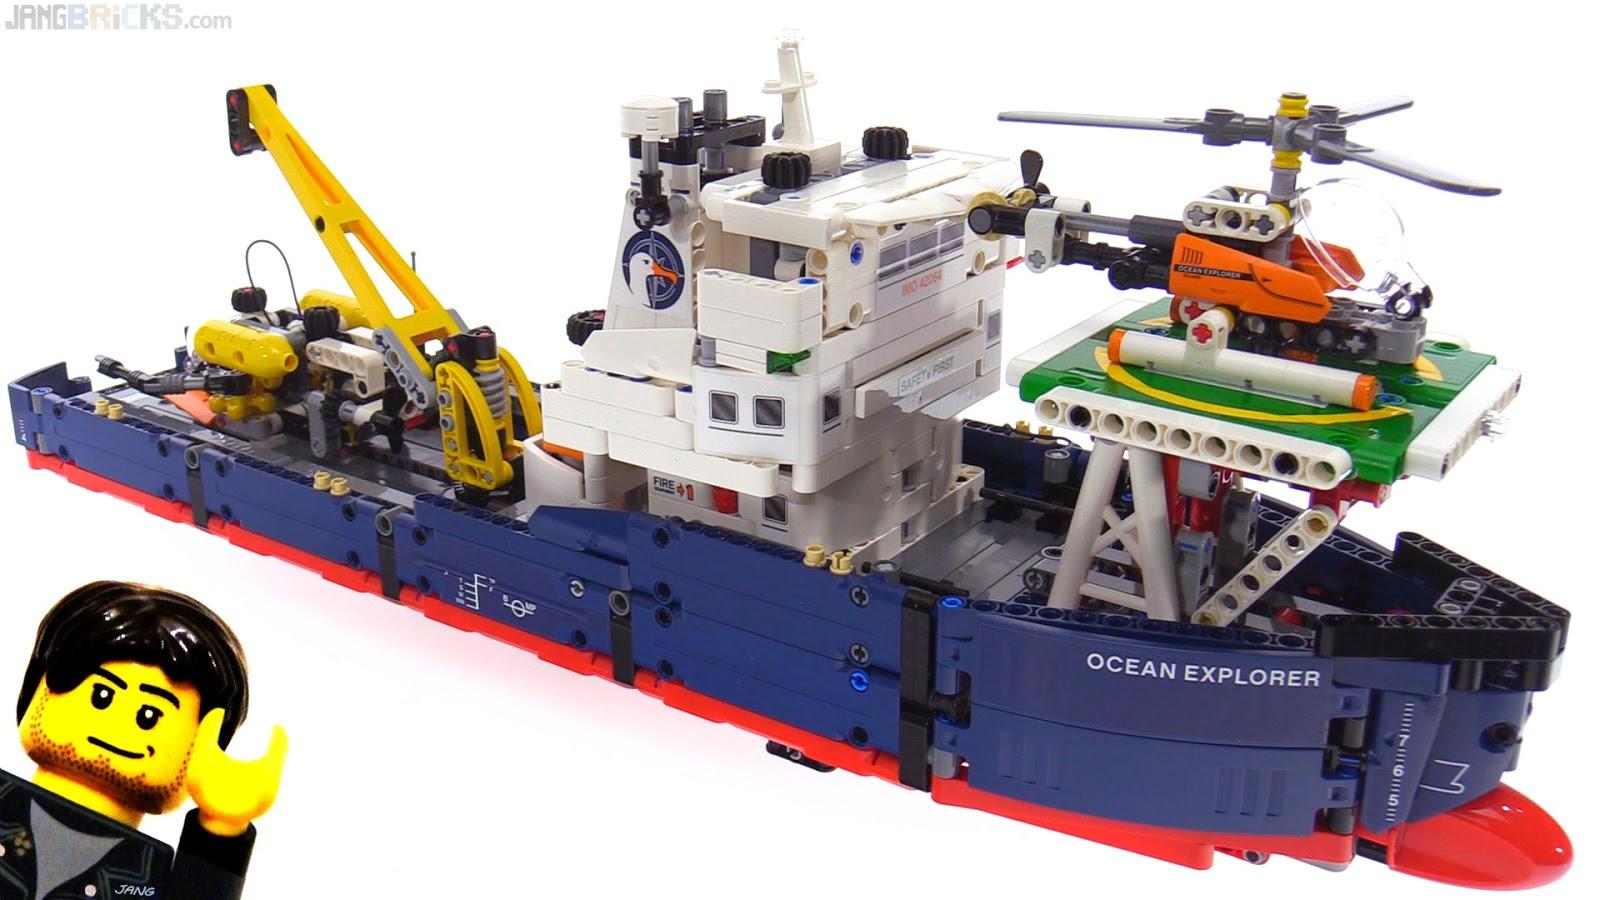 LEGO Technic Ocean Explorer review 42064